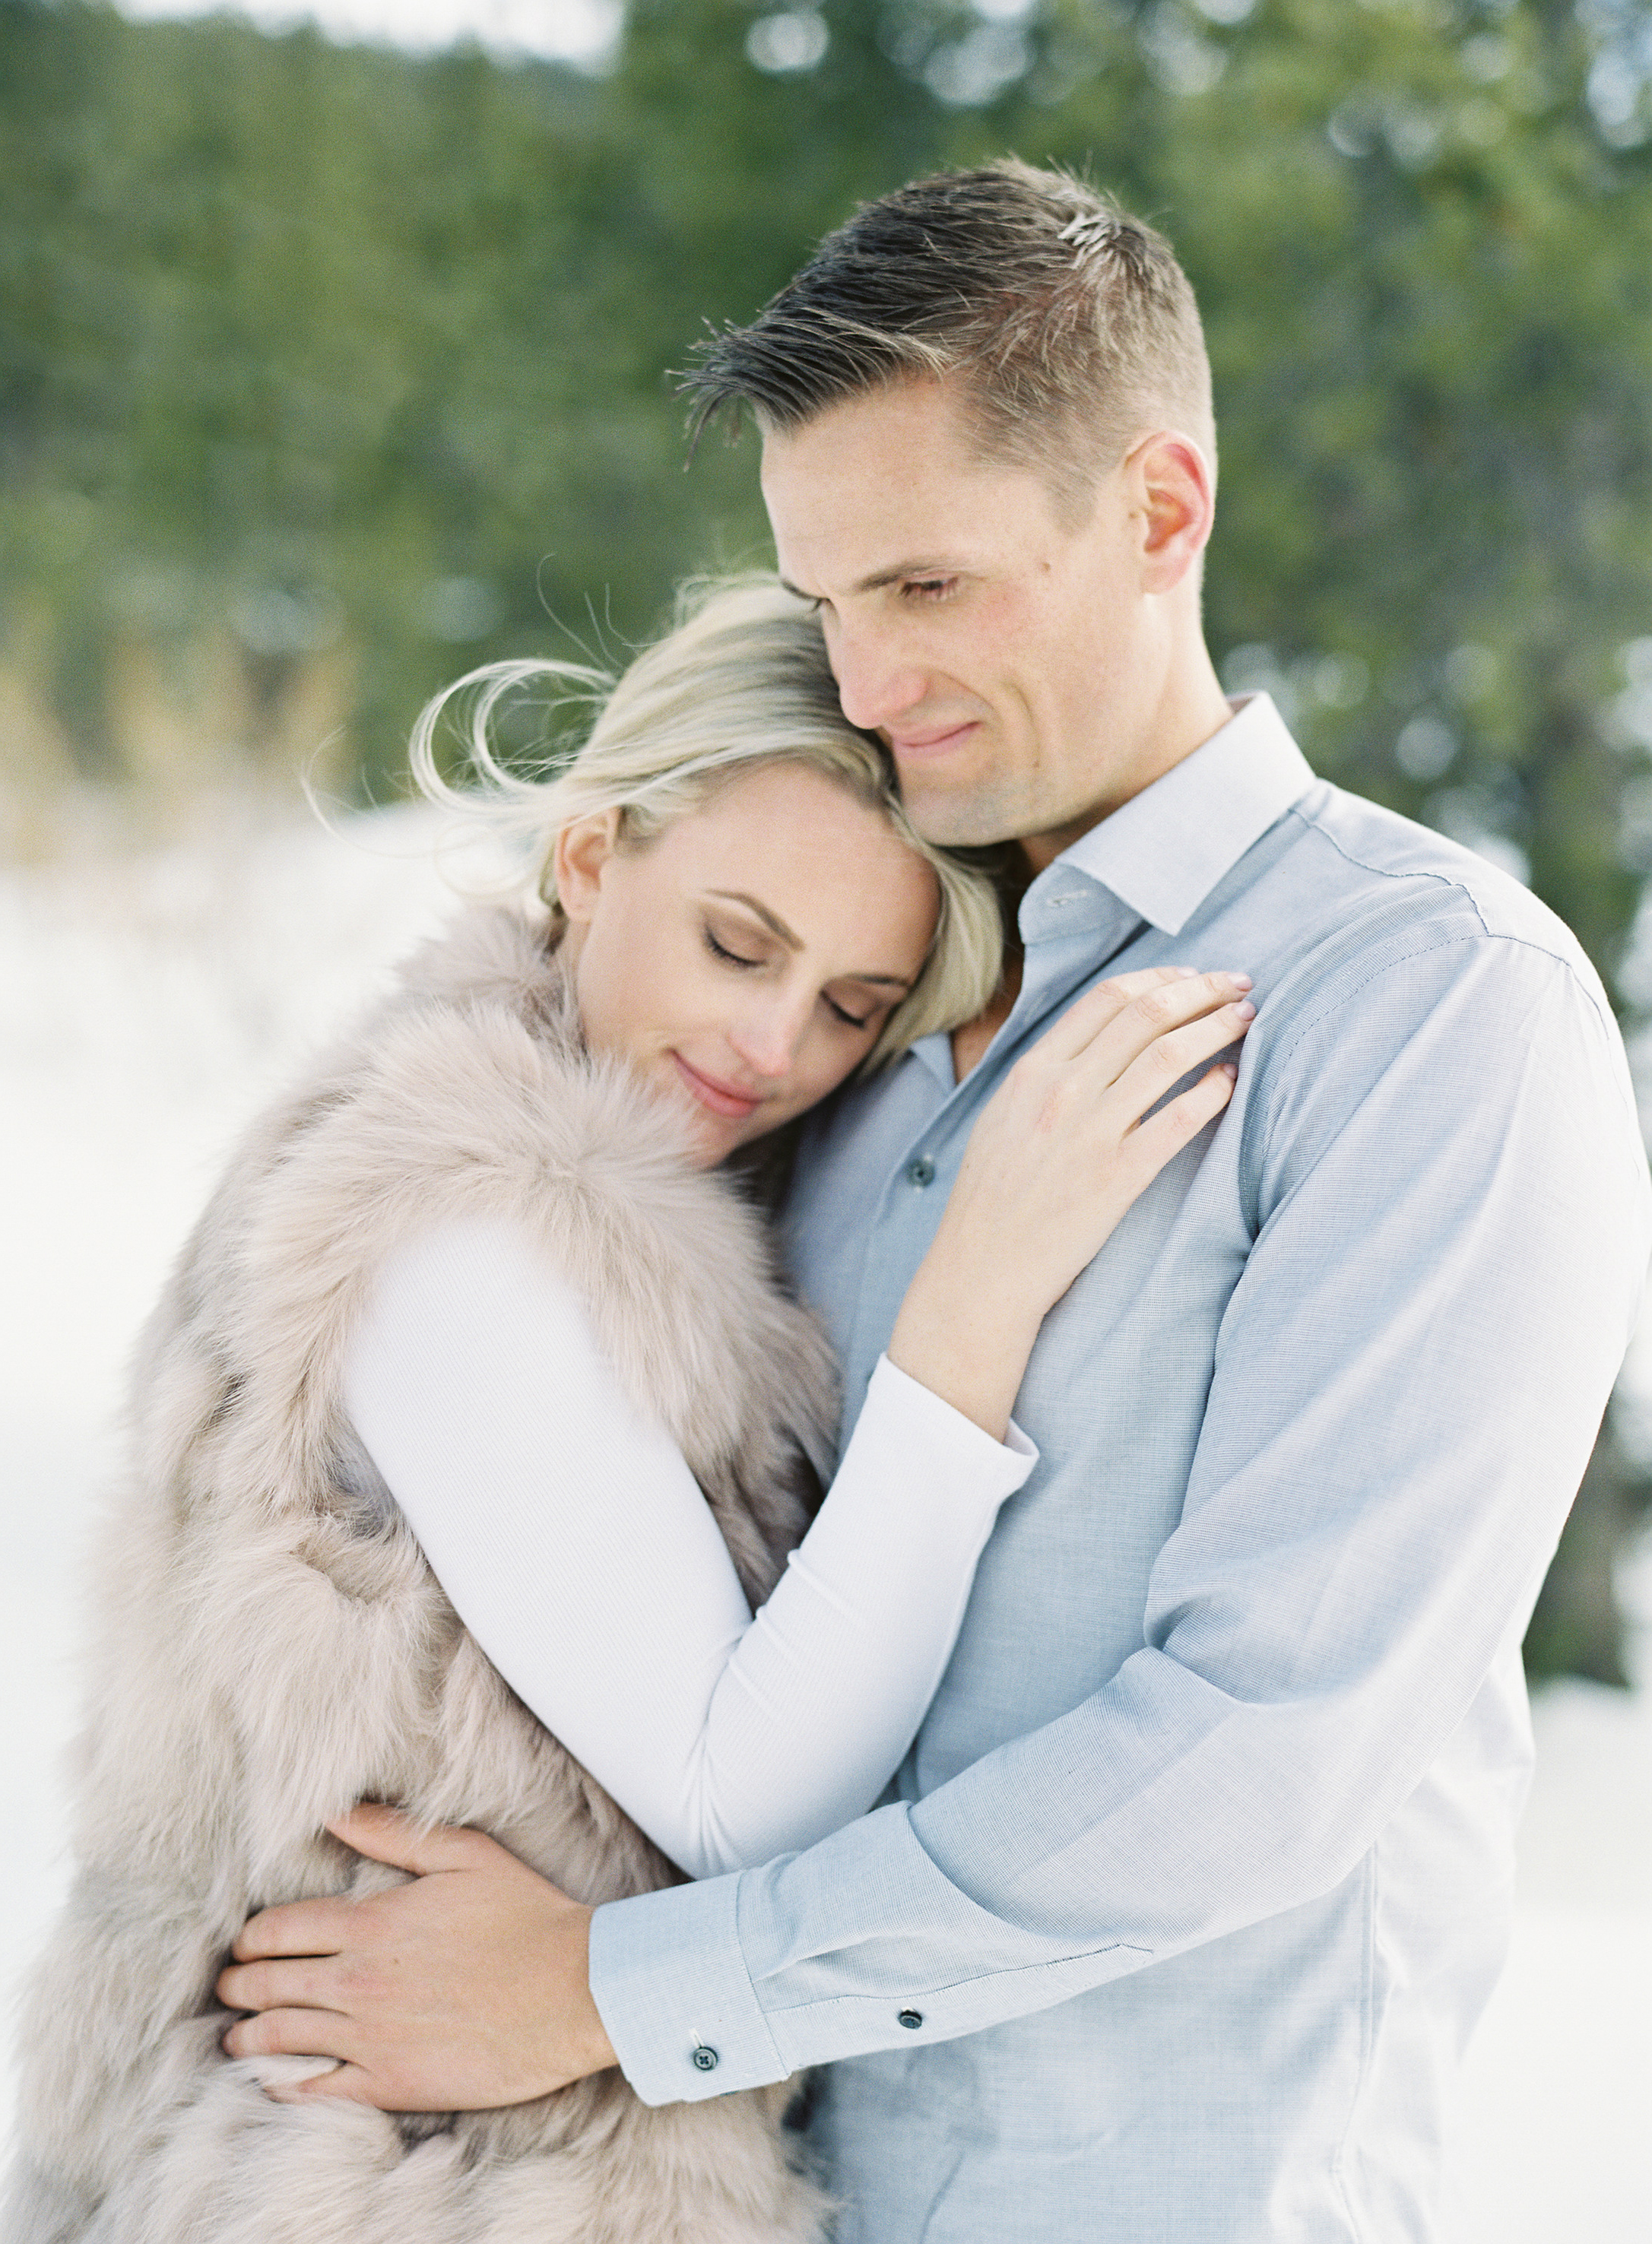 Sarah and John Engaged-Carrie King Photographer6.jpg